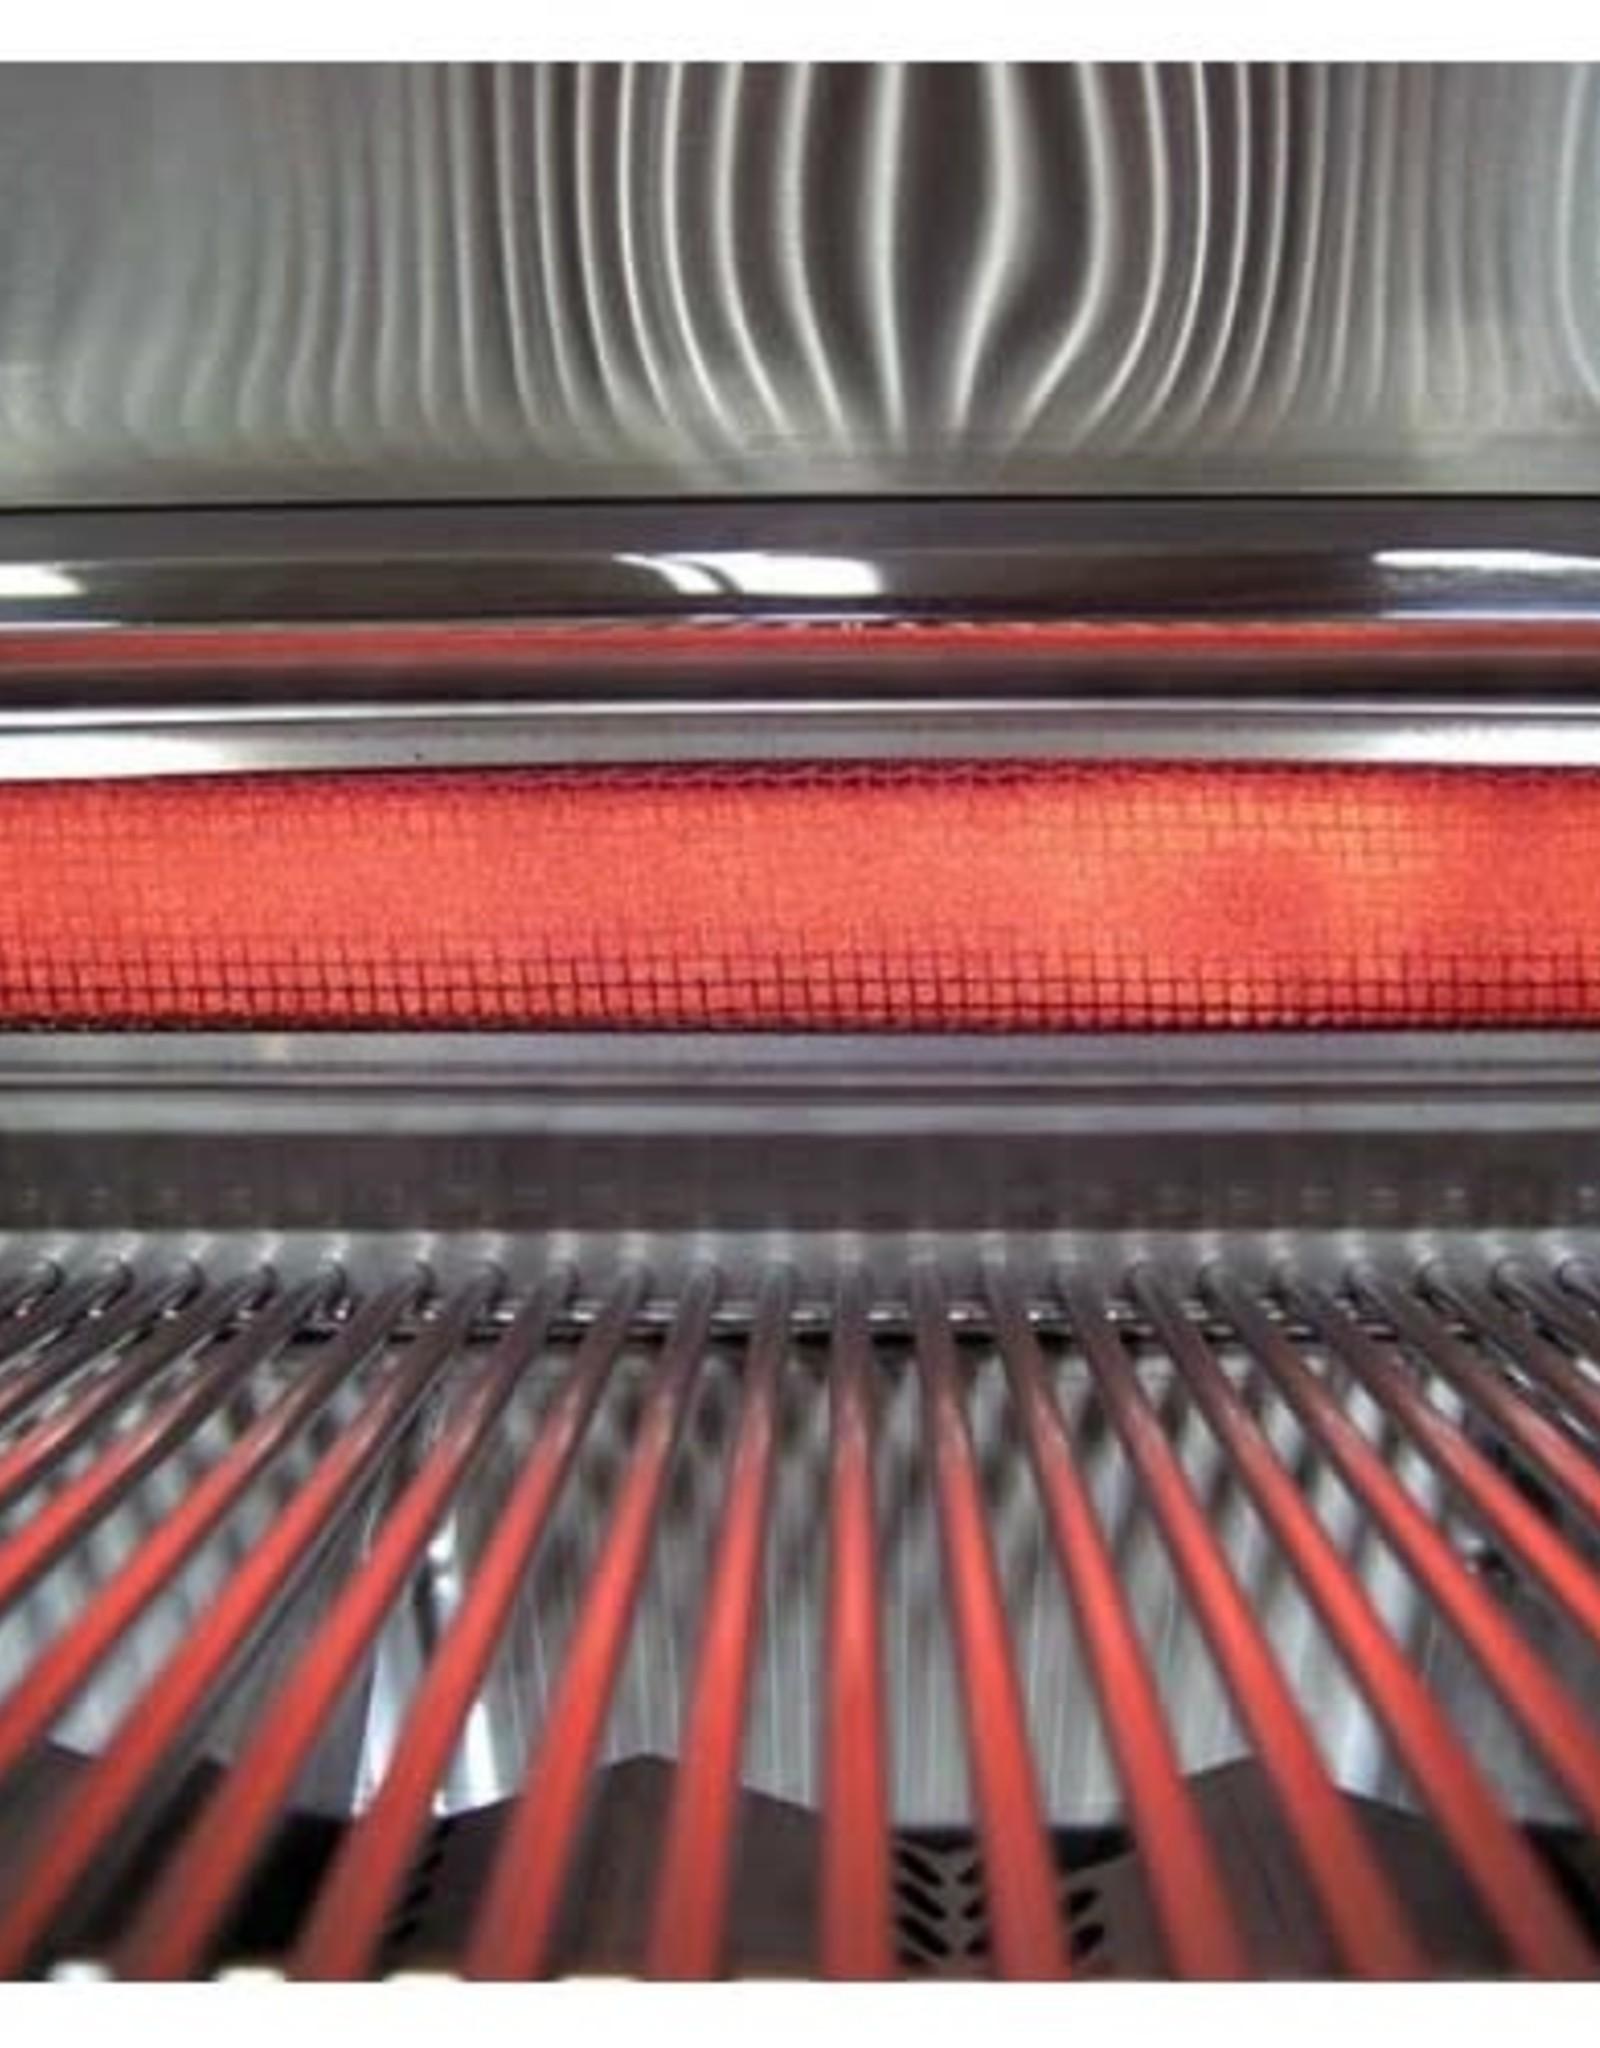 Fire Magic Fire Magic - Echelon Diamond E1060s 48-inch Portable Grill with Single Side Burner (Analog)